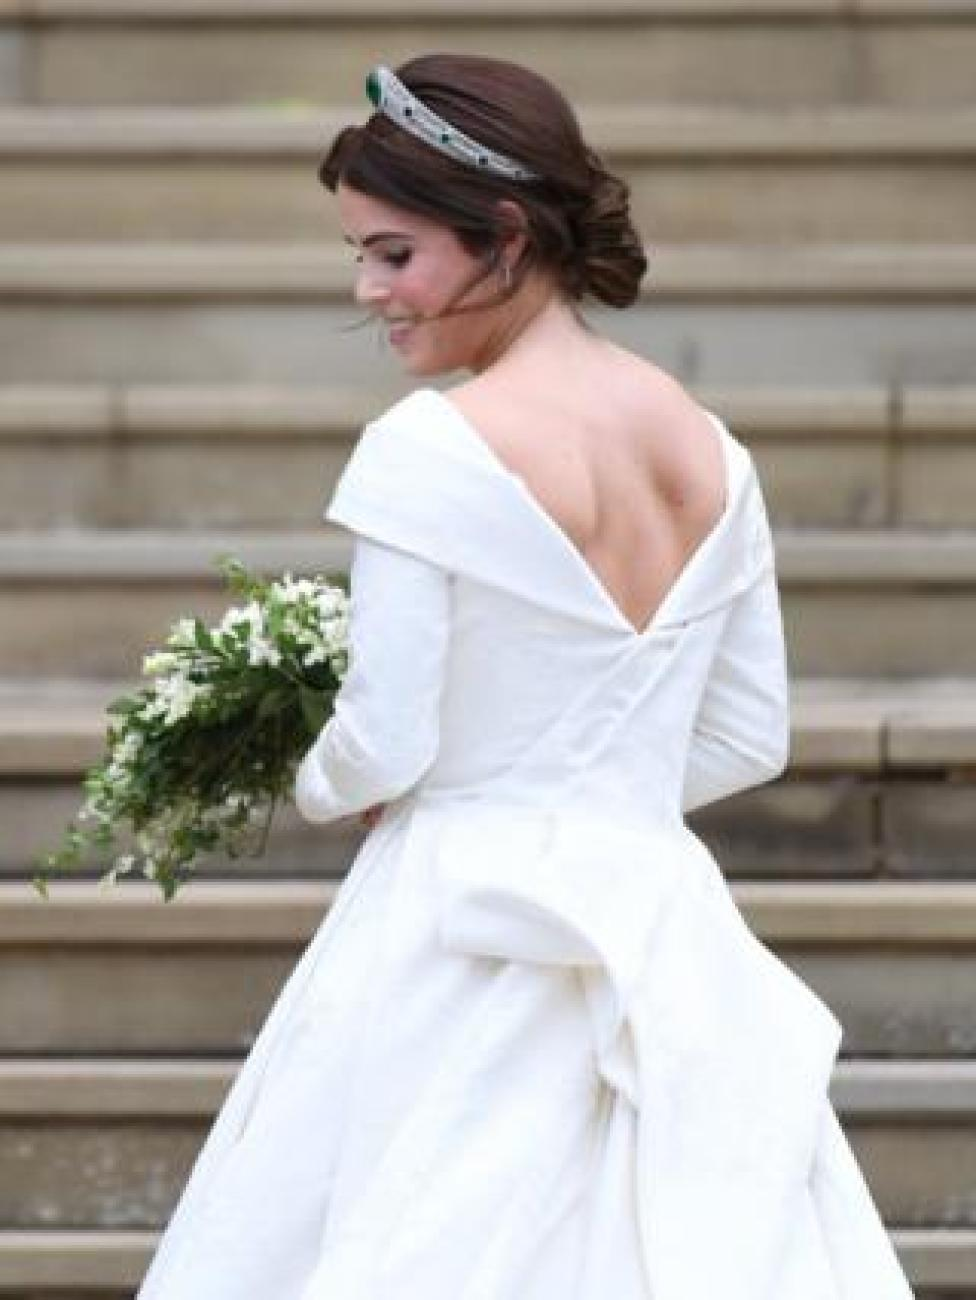 NEWS Princess Eugenie of York arrives for her royal wedding ceremony